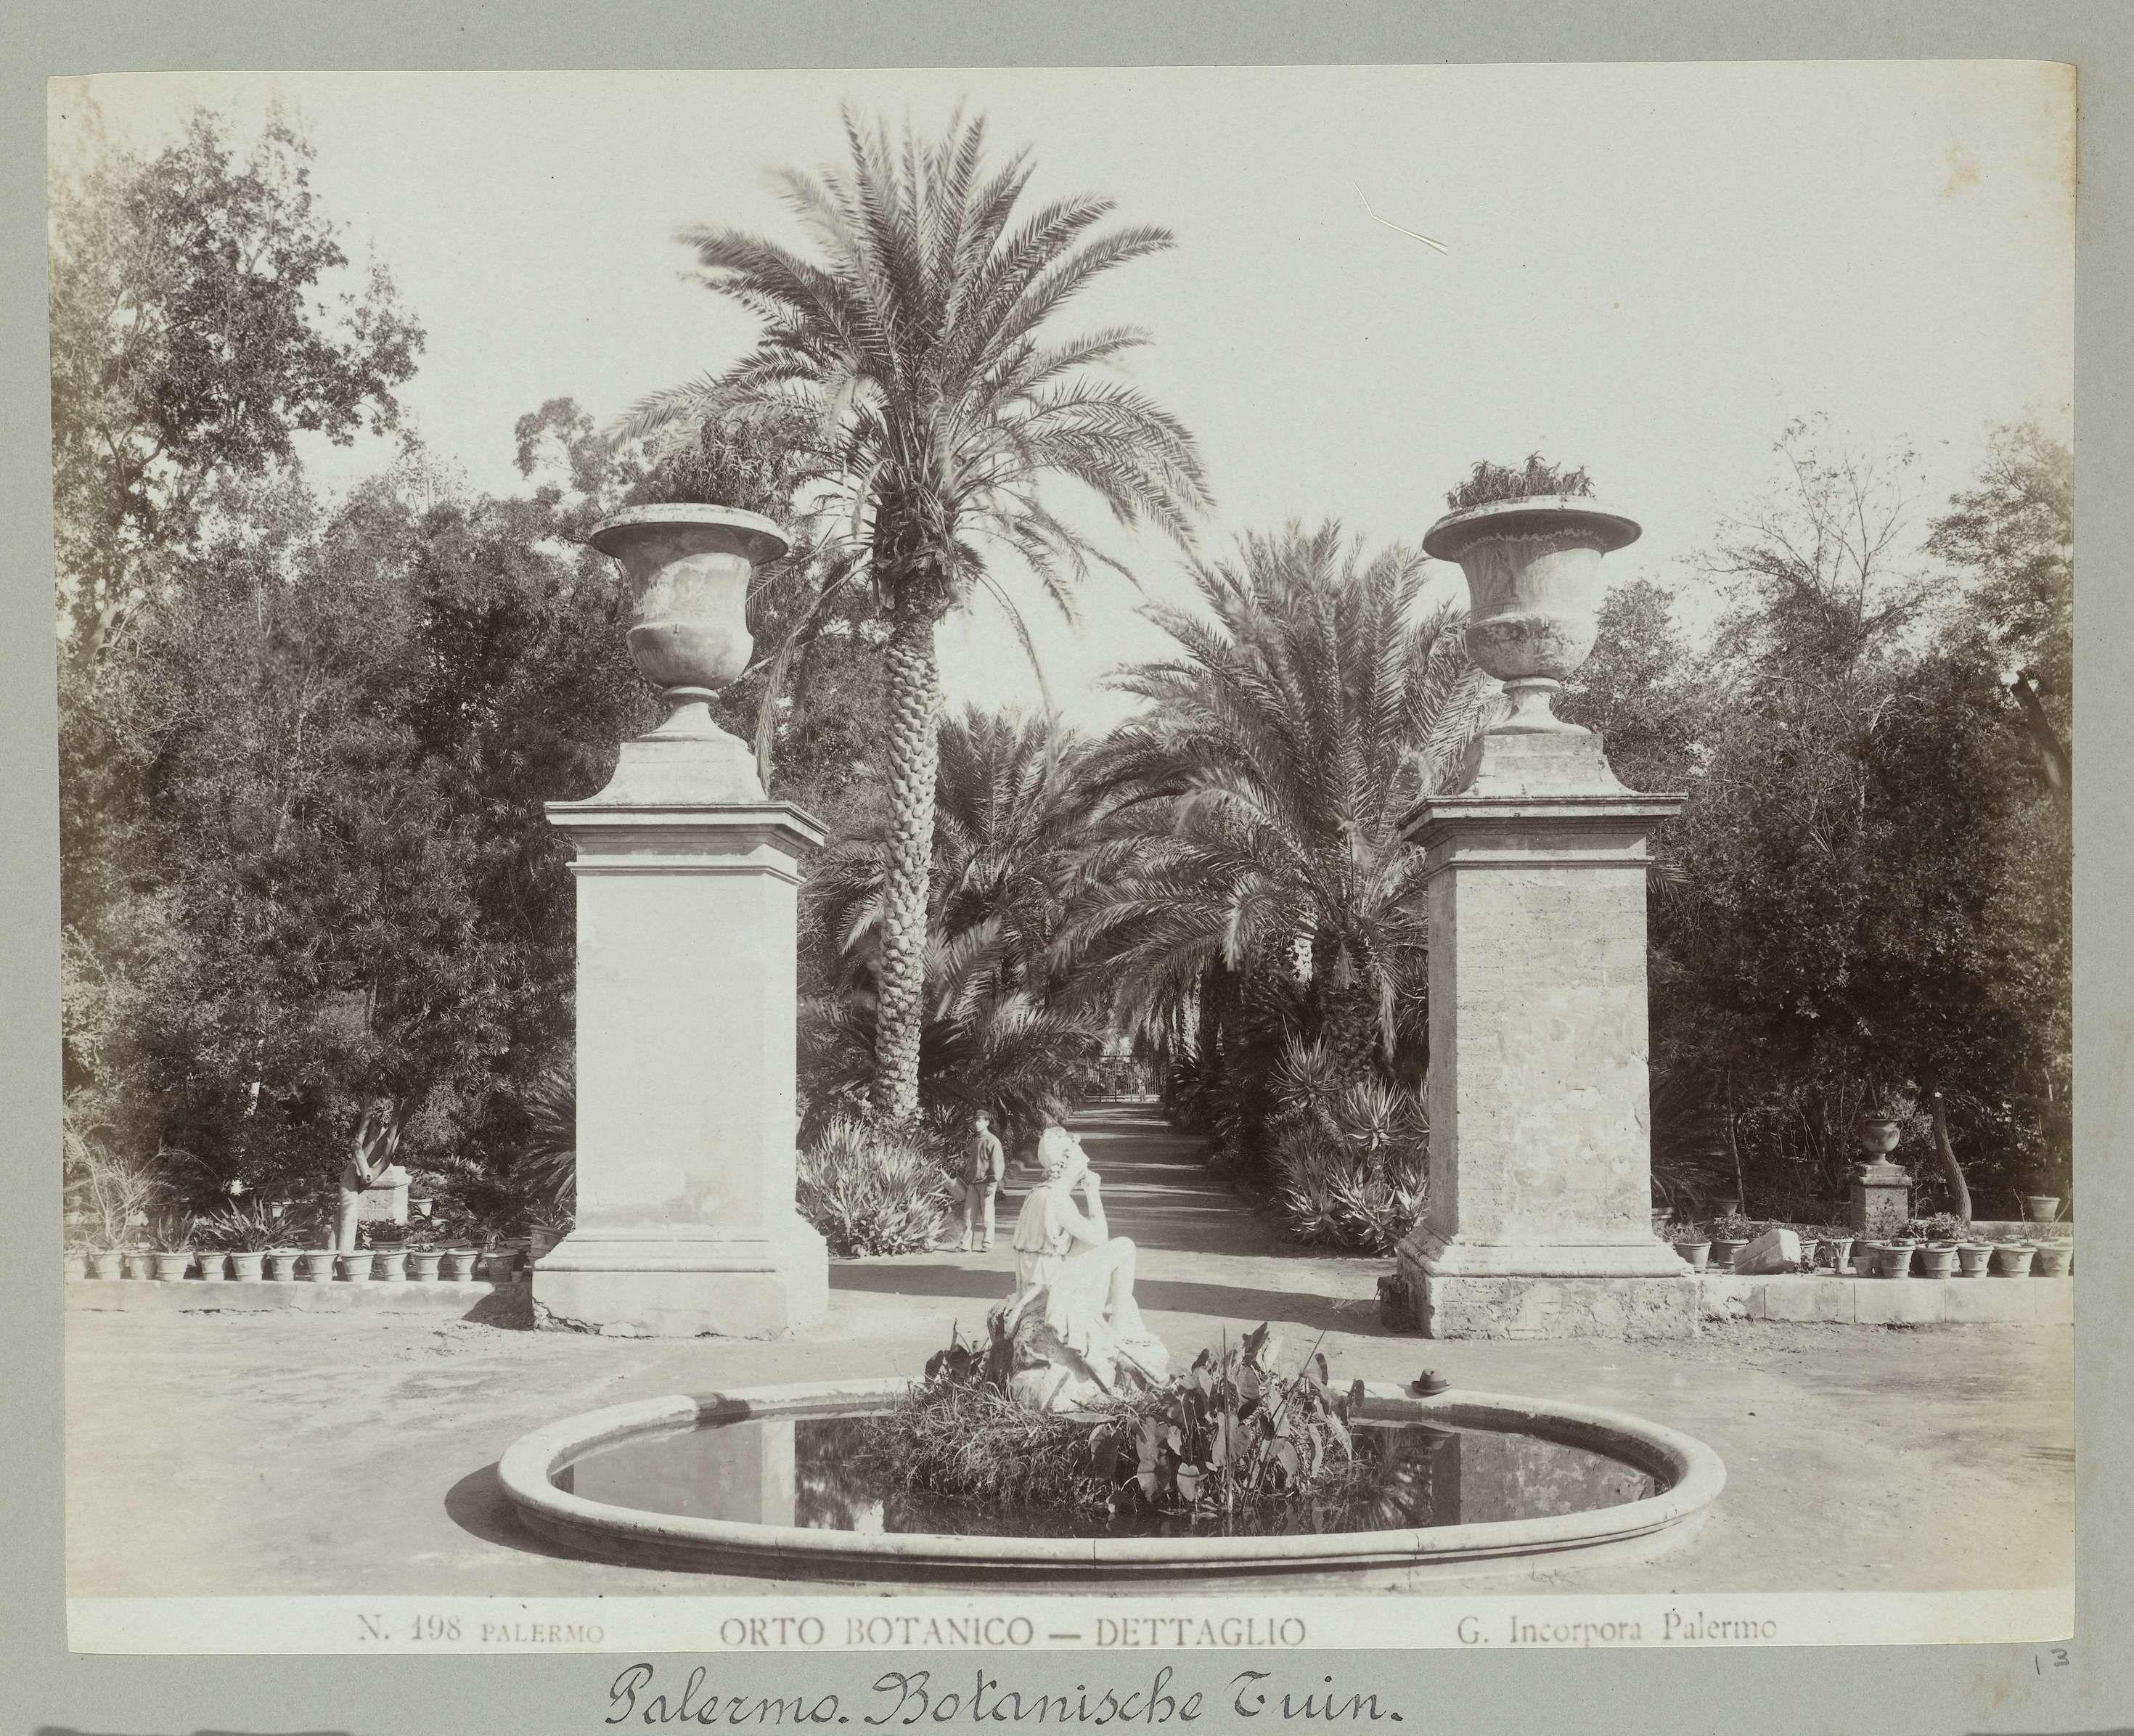 Giuseppe Incorpora | N. 198 Palermo, Orto Botanico - Dettaglio, Giuseppe Incorpora, , c. 1893 - c. 1903 | Een vijver in de botanische tuin van Palermo.